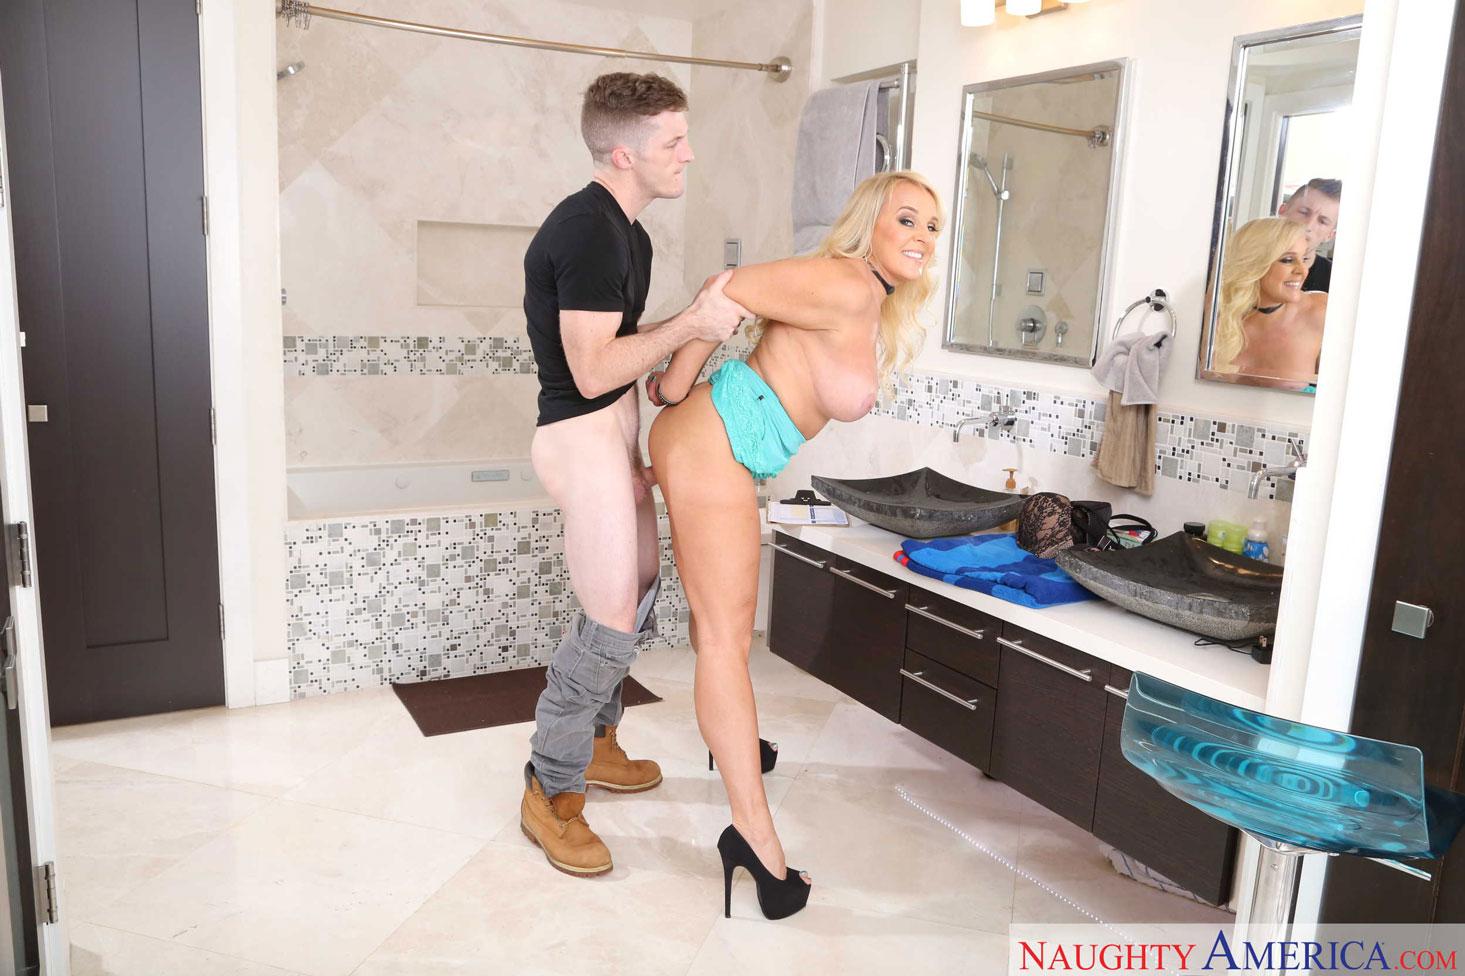 Naughty America - Alexis Golden Fucked in the Bathroom 6